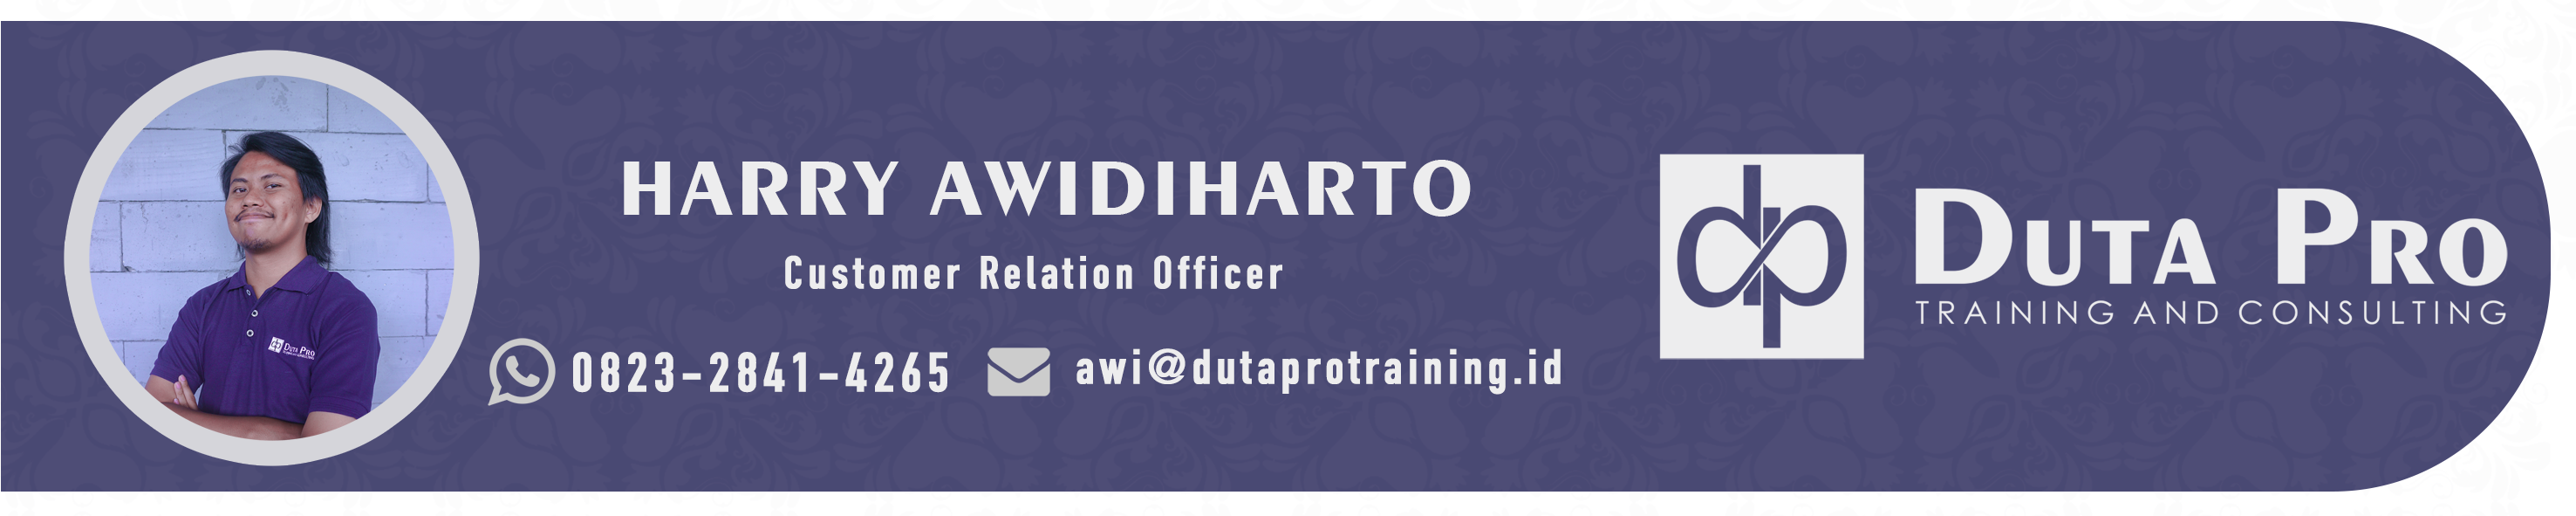 Awi contact duta pro training - Kontak Kami